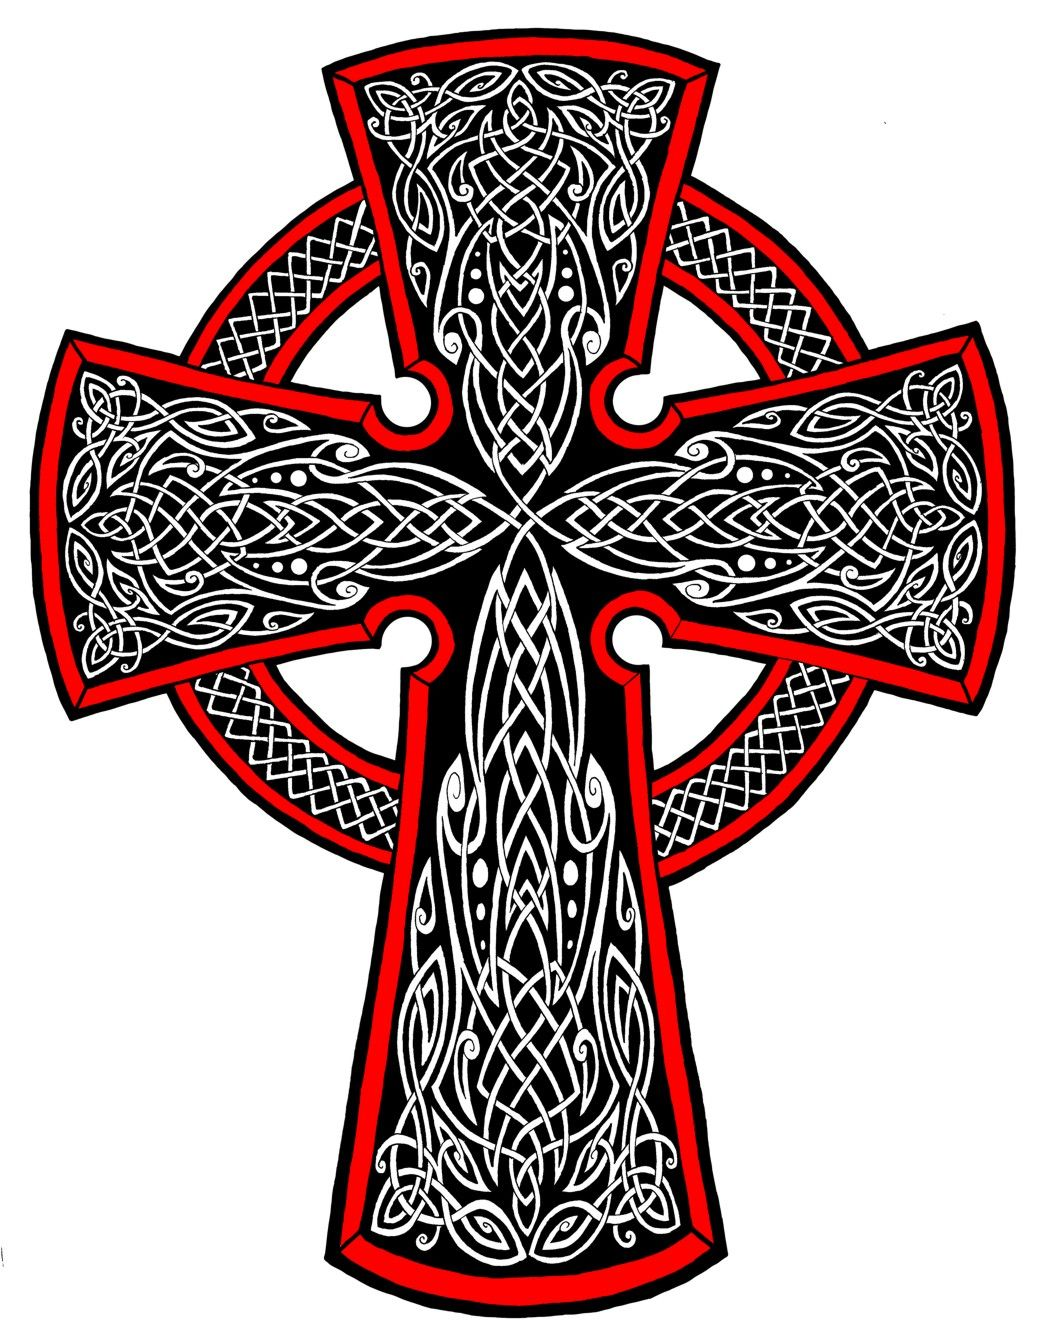 1057x1344 Celtic Cross Drawings Celtic Cross Tattoo Designs Tattoos